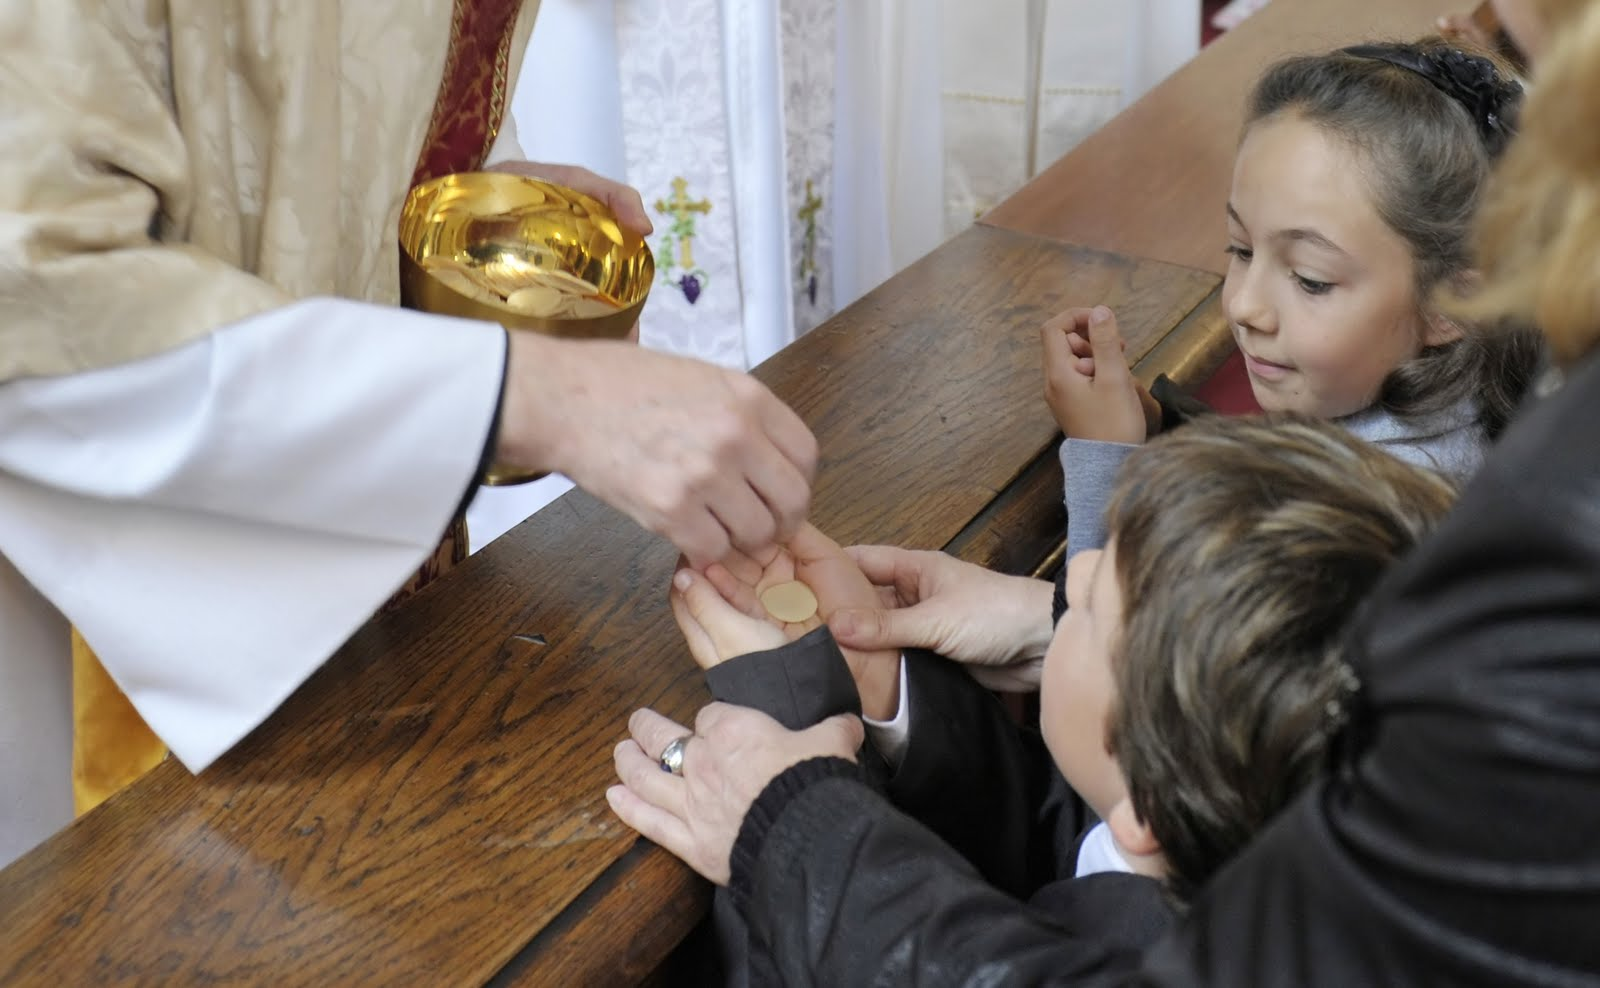 20101003-104432-02-wien-3-jauresgasse-17-19-christ-church-vienna-harvest-thanksgiving-and-first-communion-giving-of-communion-patrick-curran-nicholas-rees-alexandra-schmidt_ni_pt.jpg